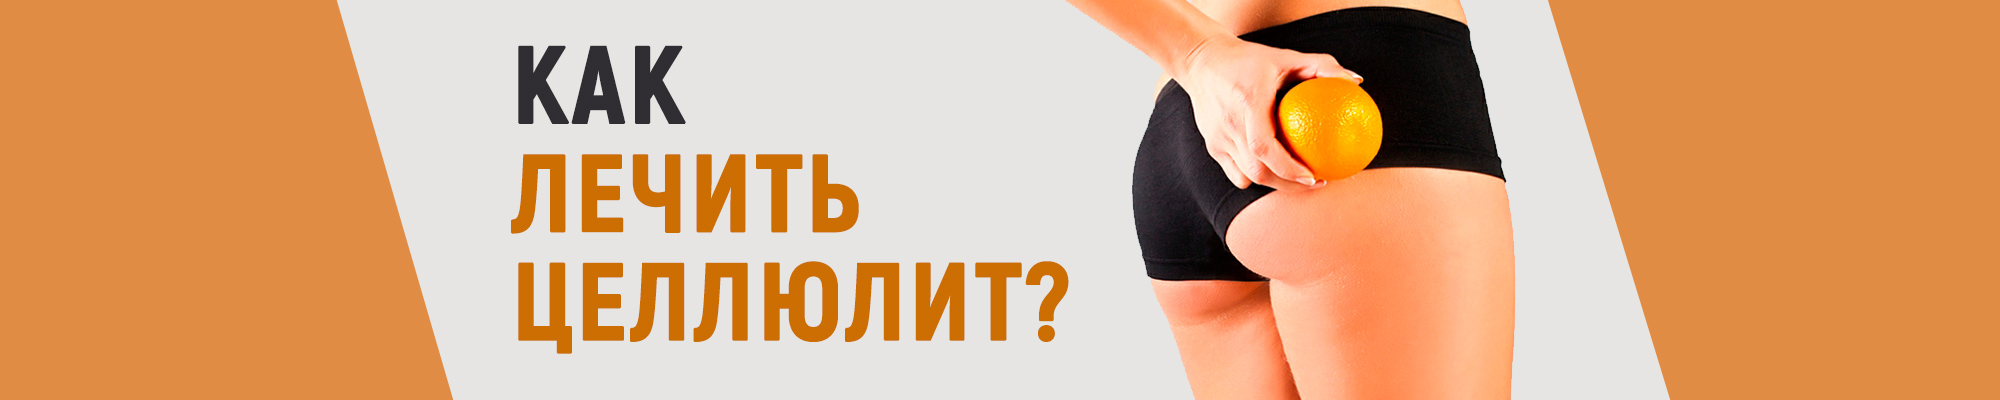 MK-cellulit-slider